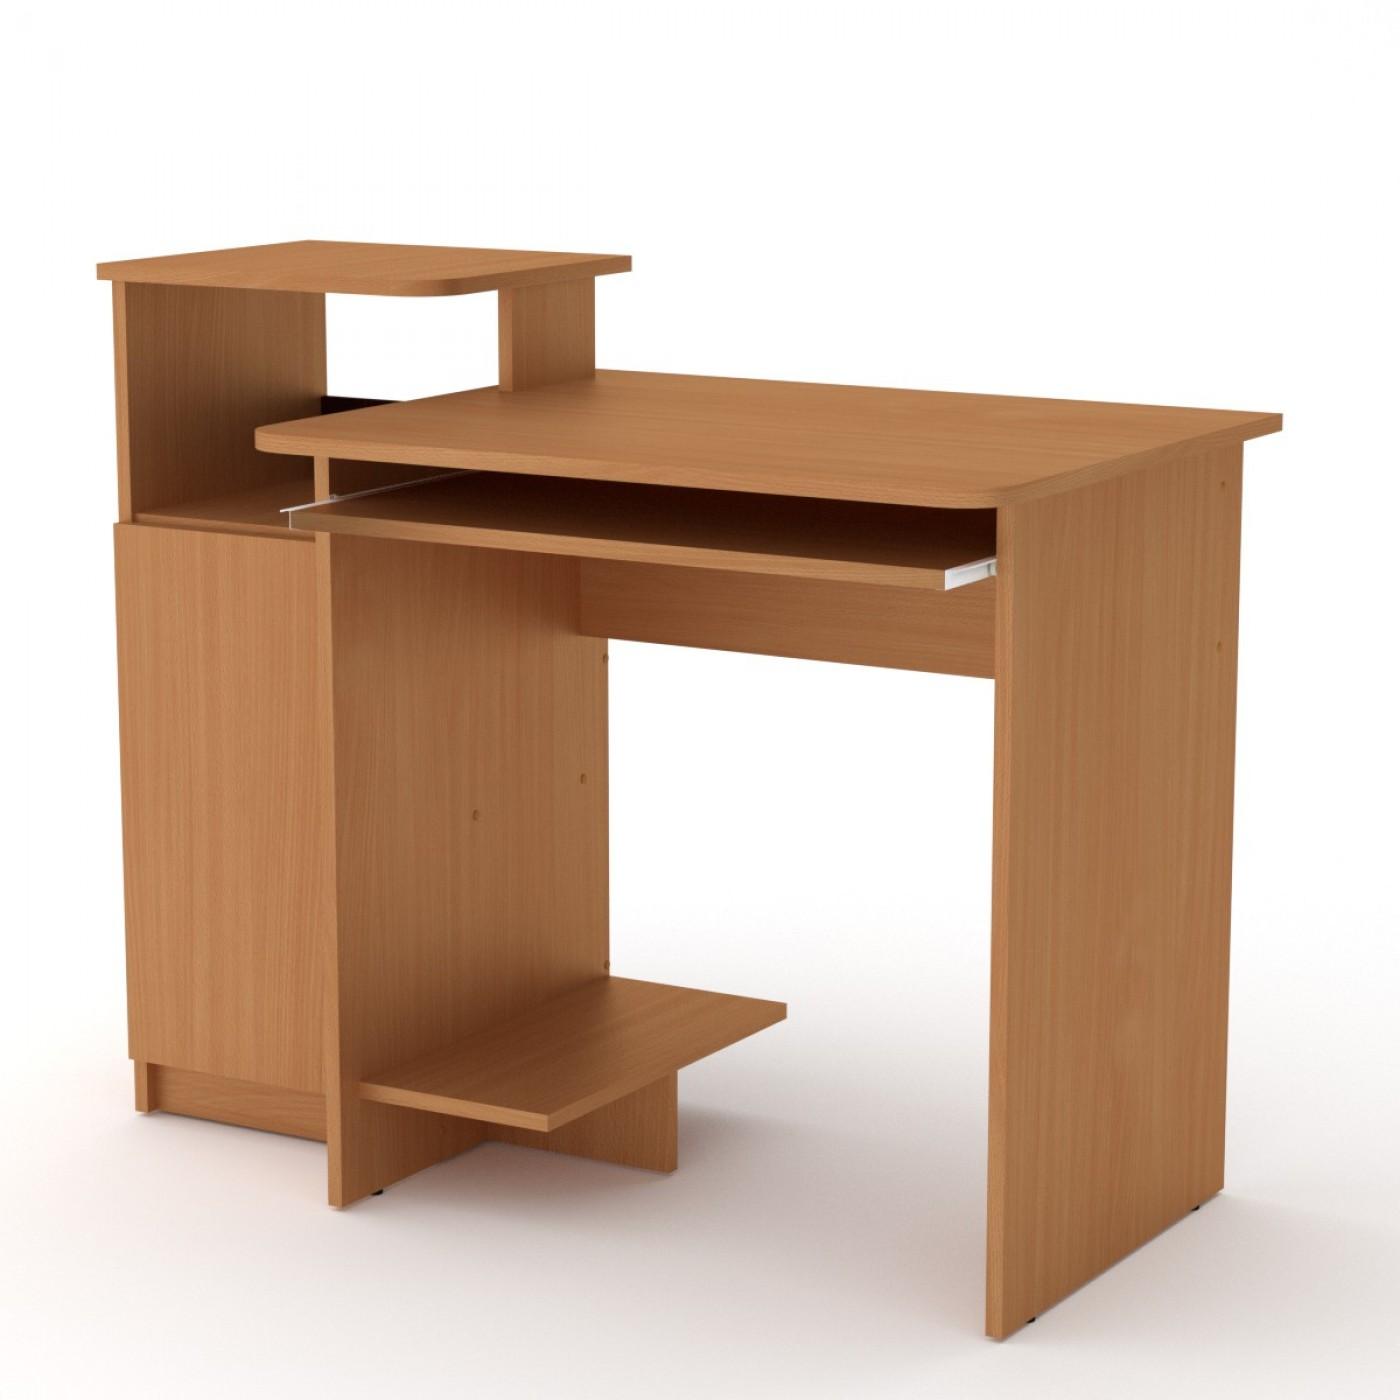 СКМ-2 стол компьютерный